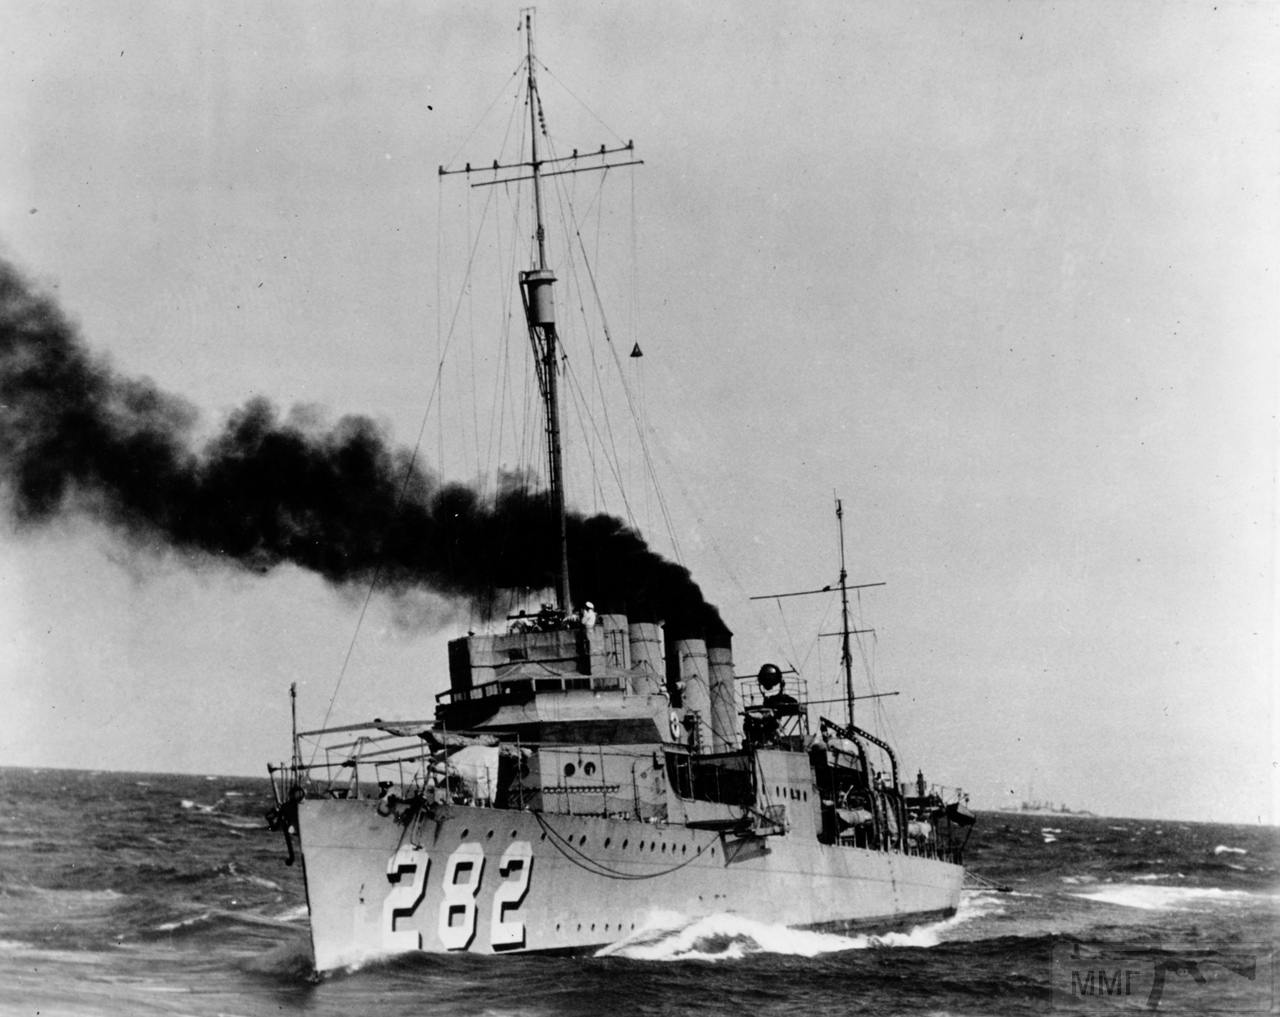 55910 - USS Toucey (DD-282)